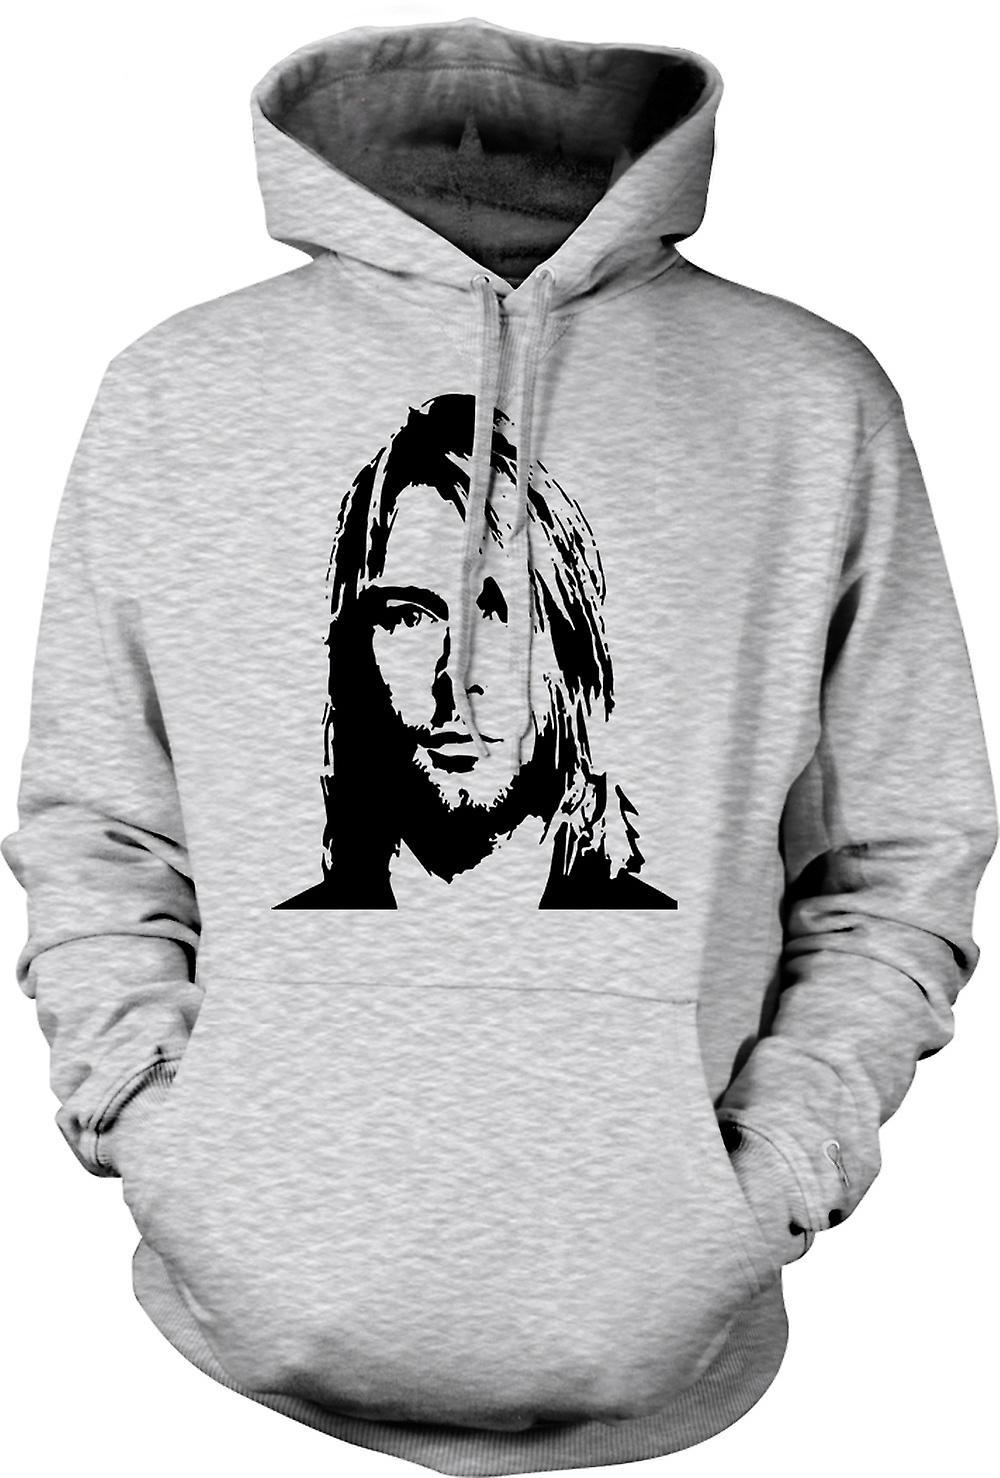 Mens Hoodie - Nirvana - Kurt Cobain - Croquis